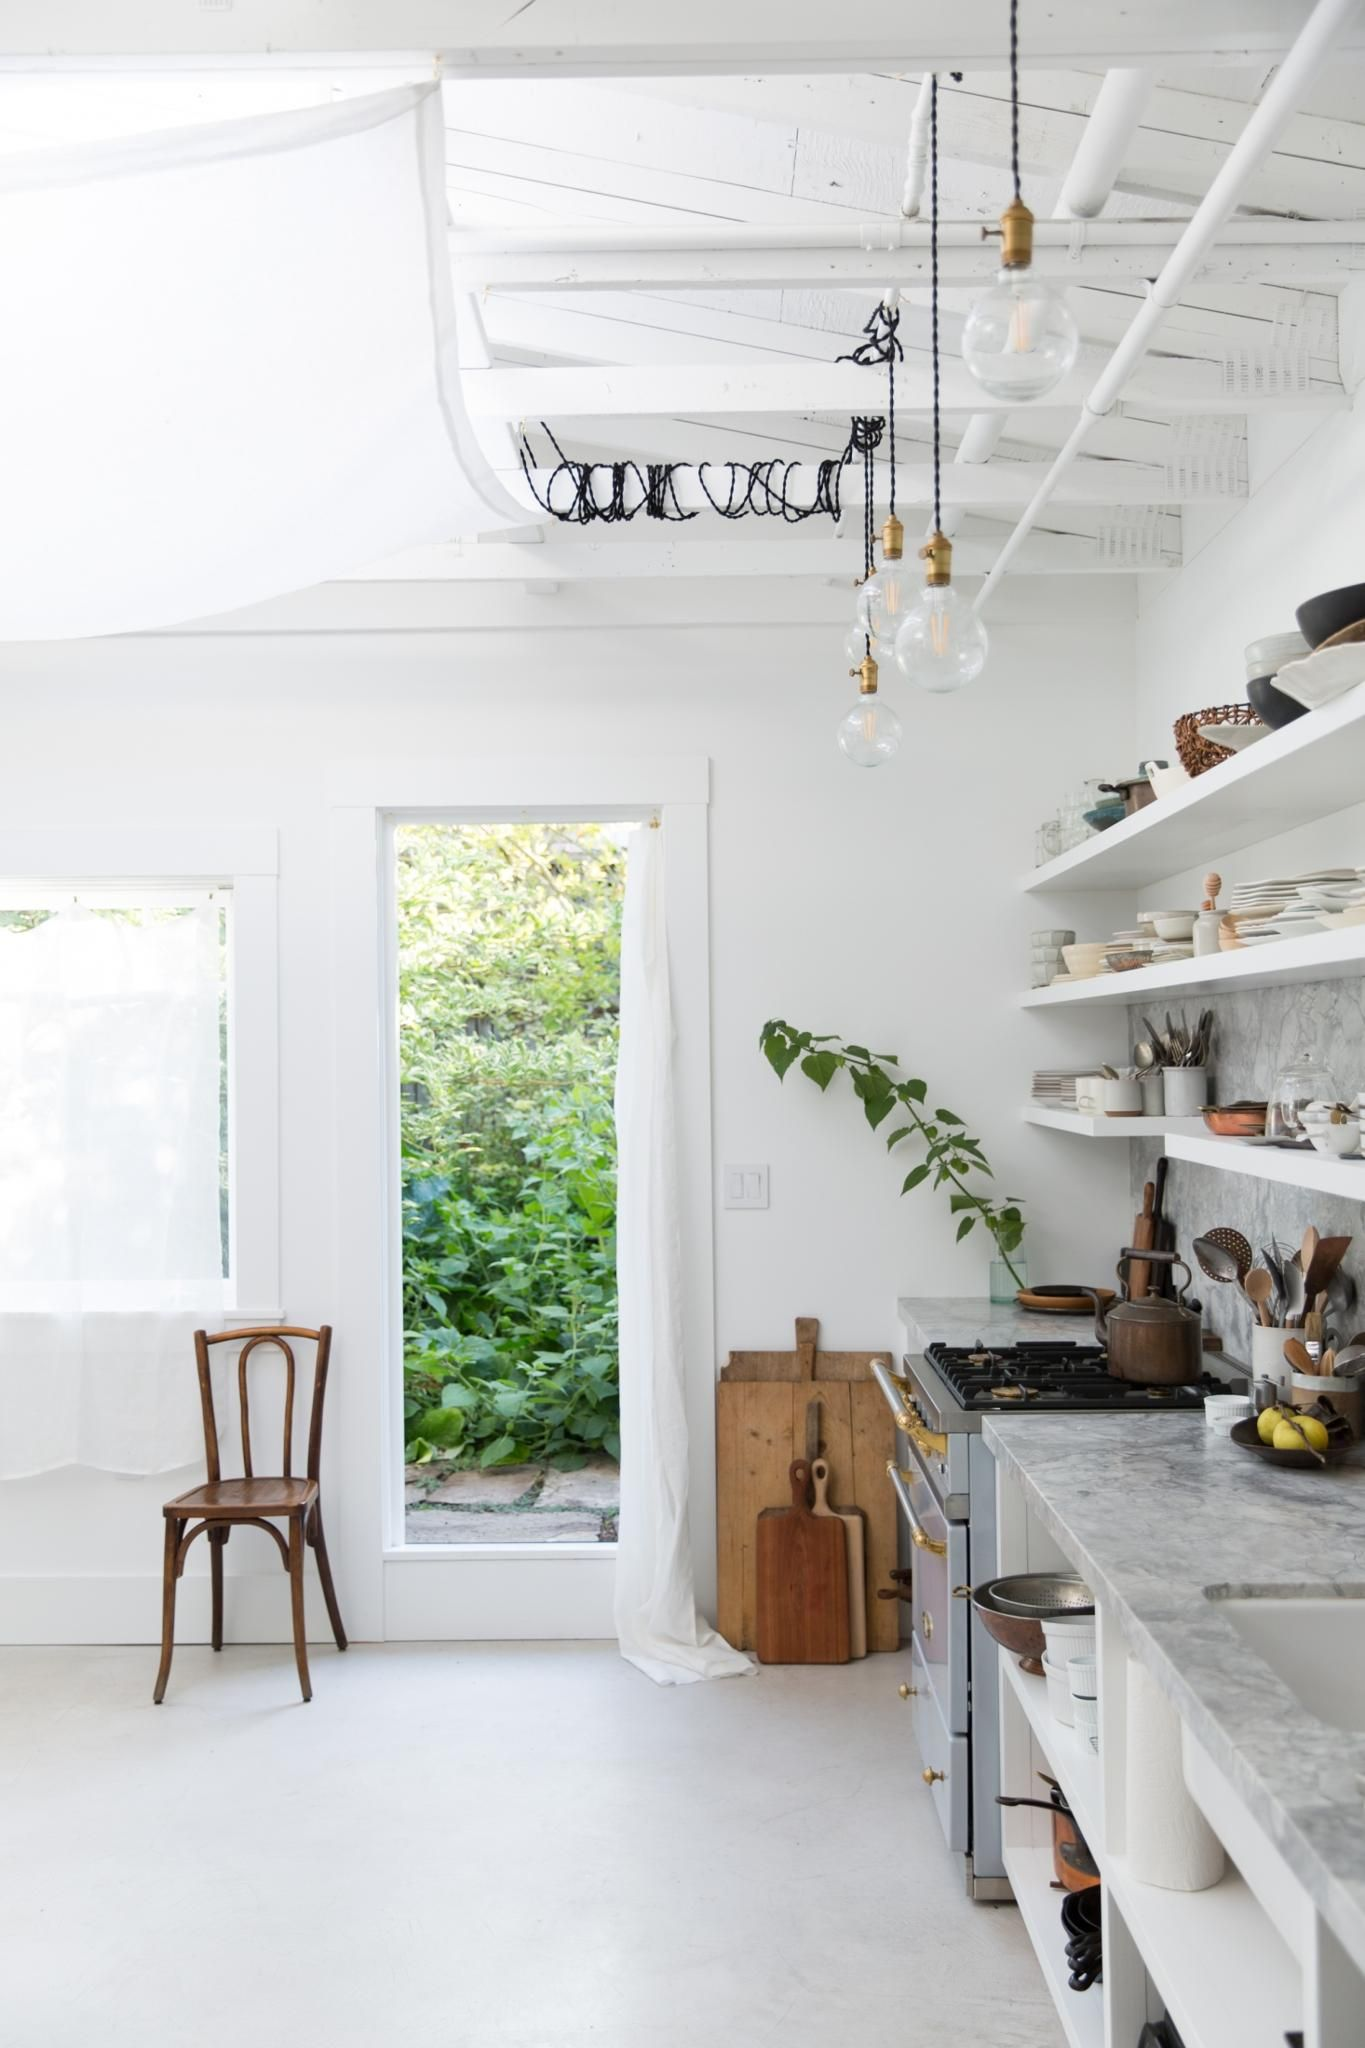 Kitchen of the Week: A Backyard Kitchen in Berkeley, Ceramics ...